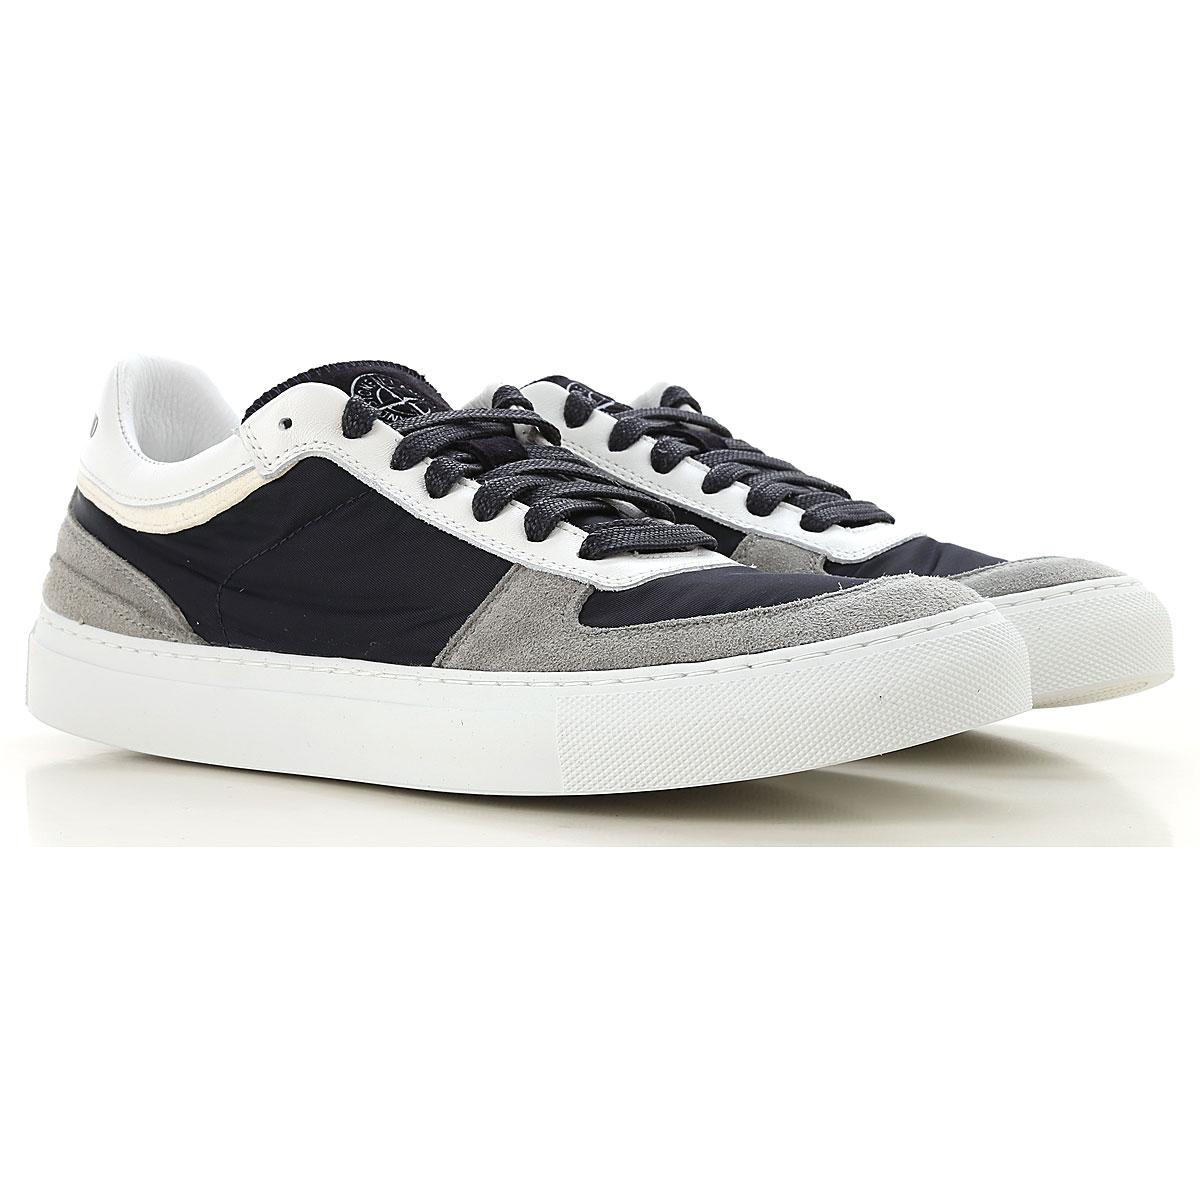 Stone Island Sneaker Homme, Bleu marine, Nylon, 2017, 40 41 42 43 44